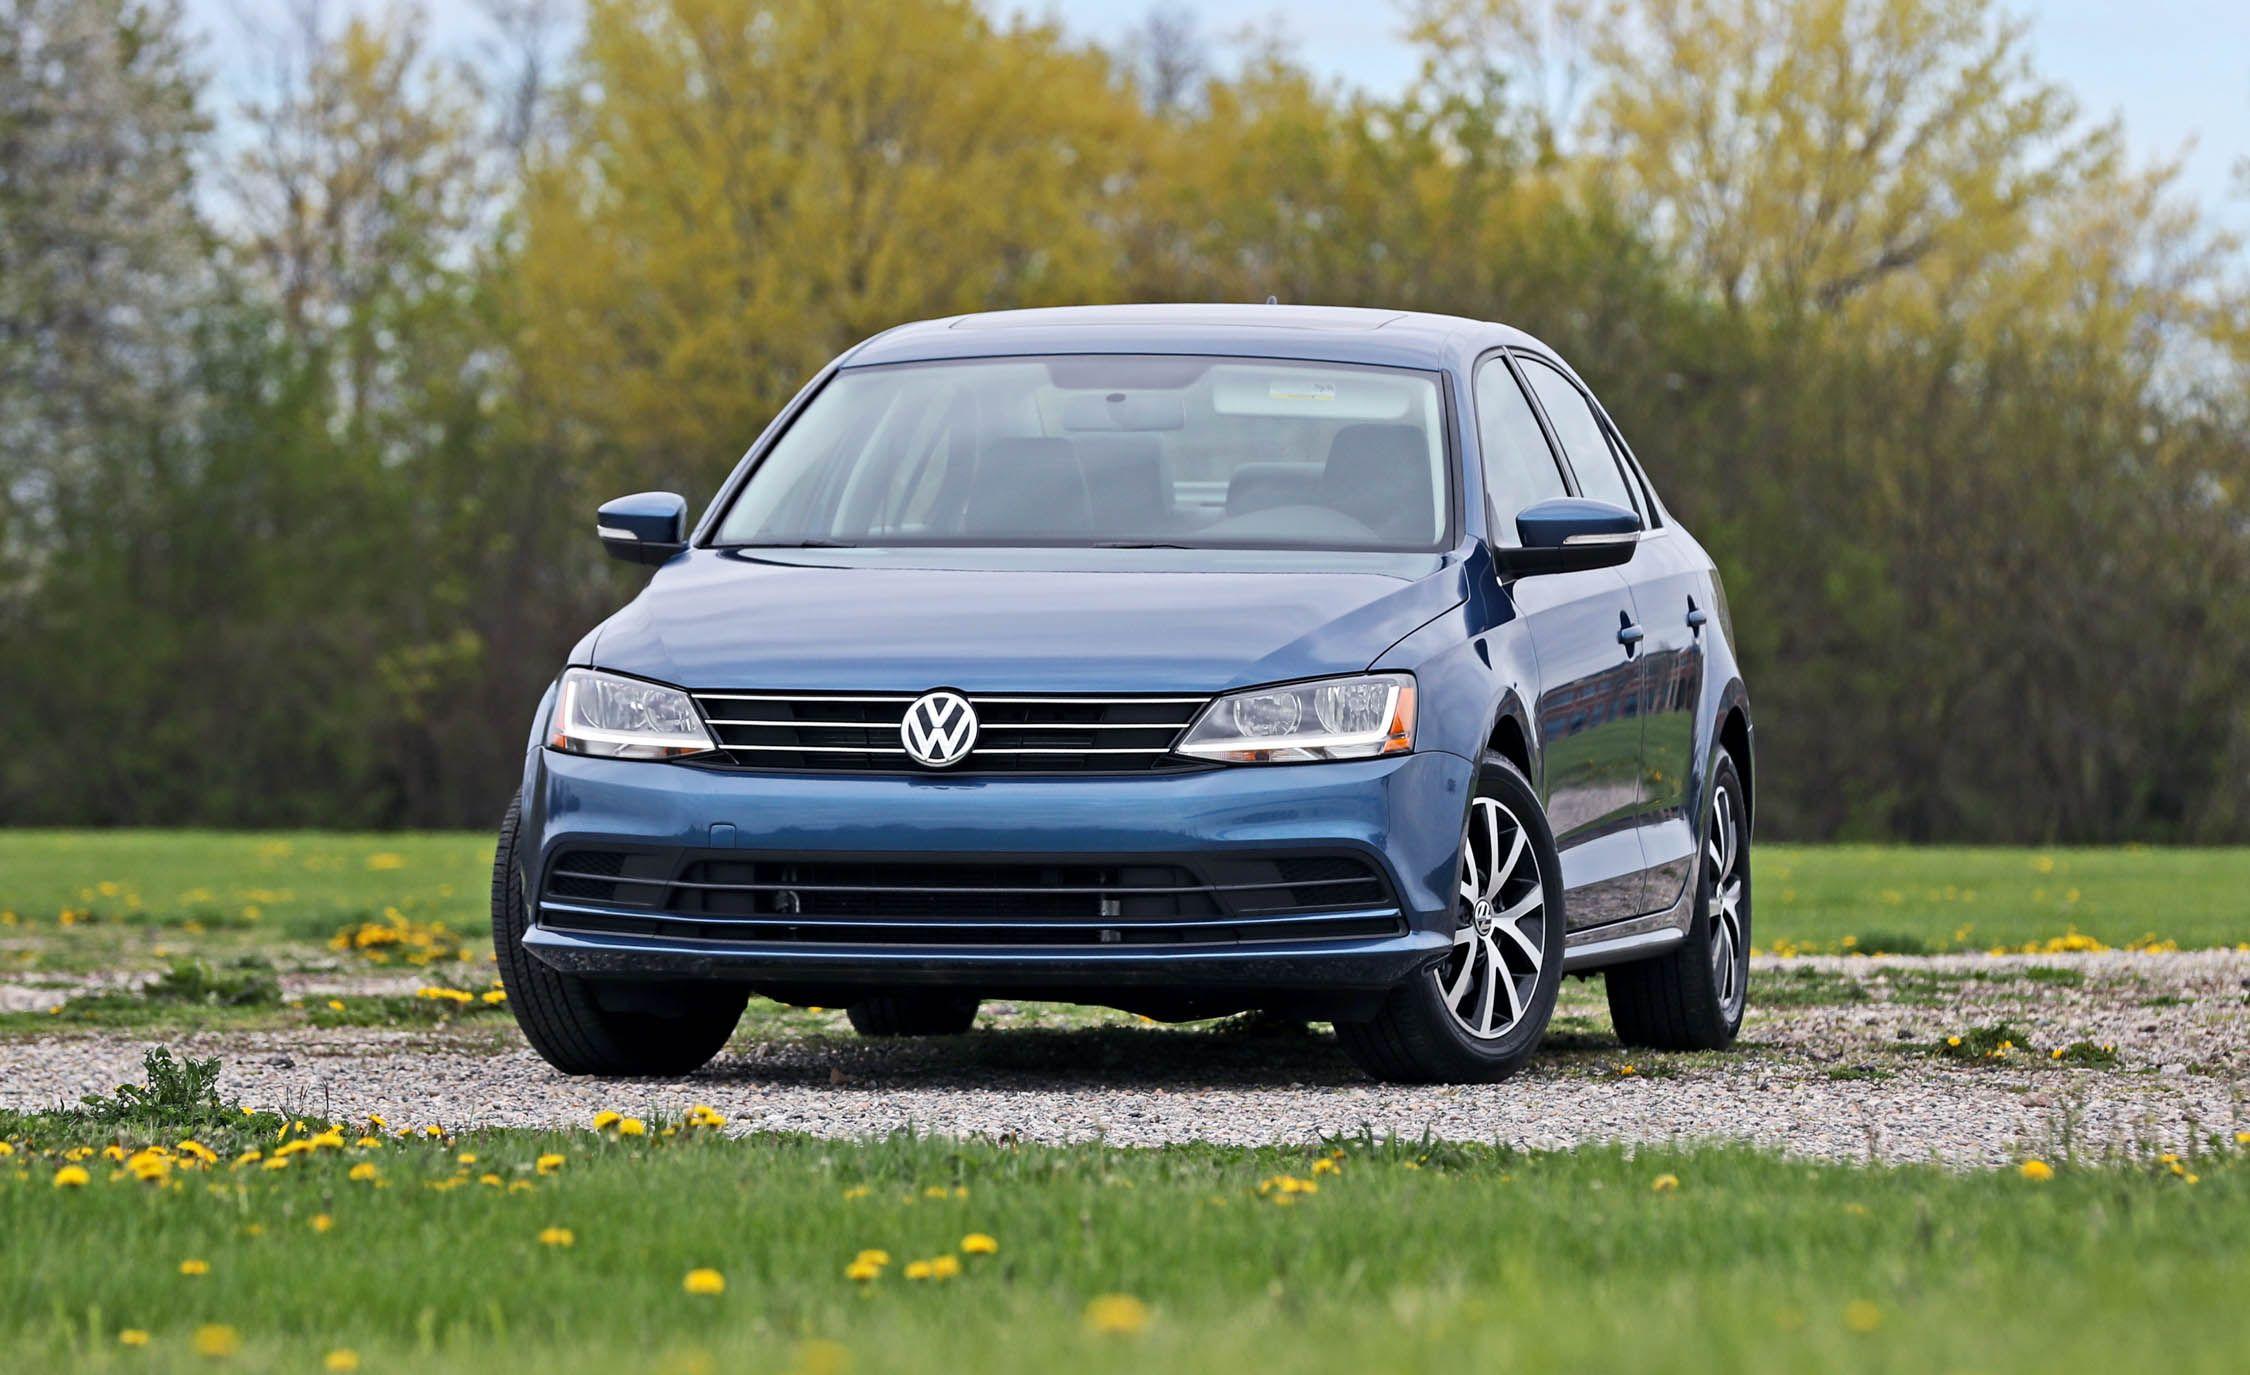 2016 Volkswagen Jetta 14t Test Review Car And Driver 2009 Wolfsburg Engine Diagram